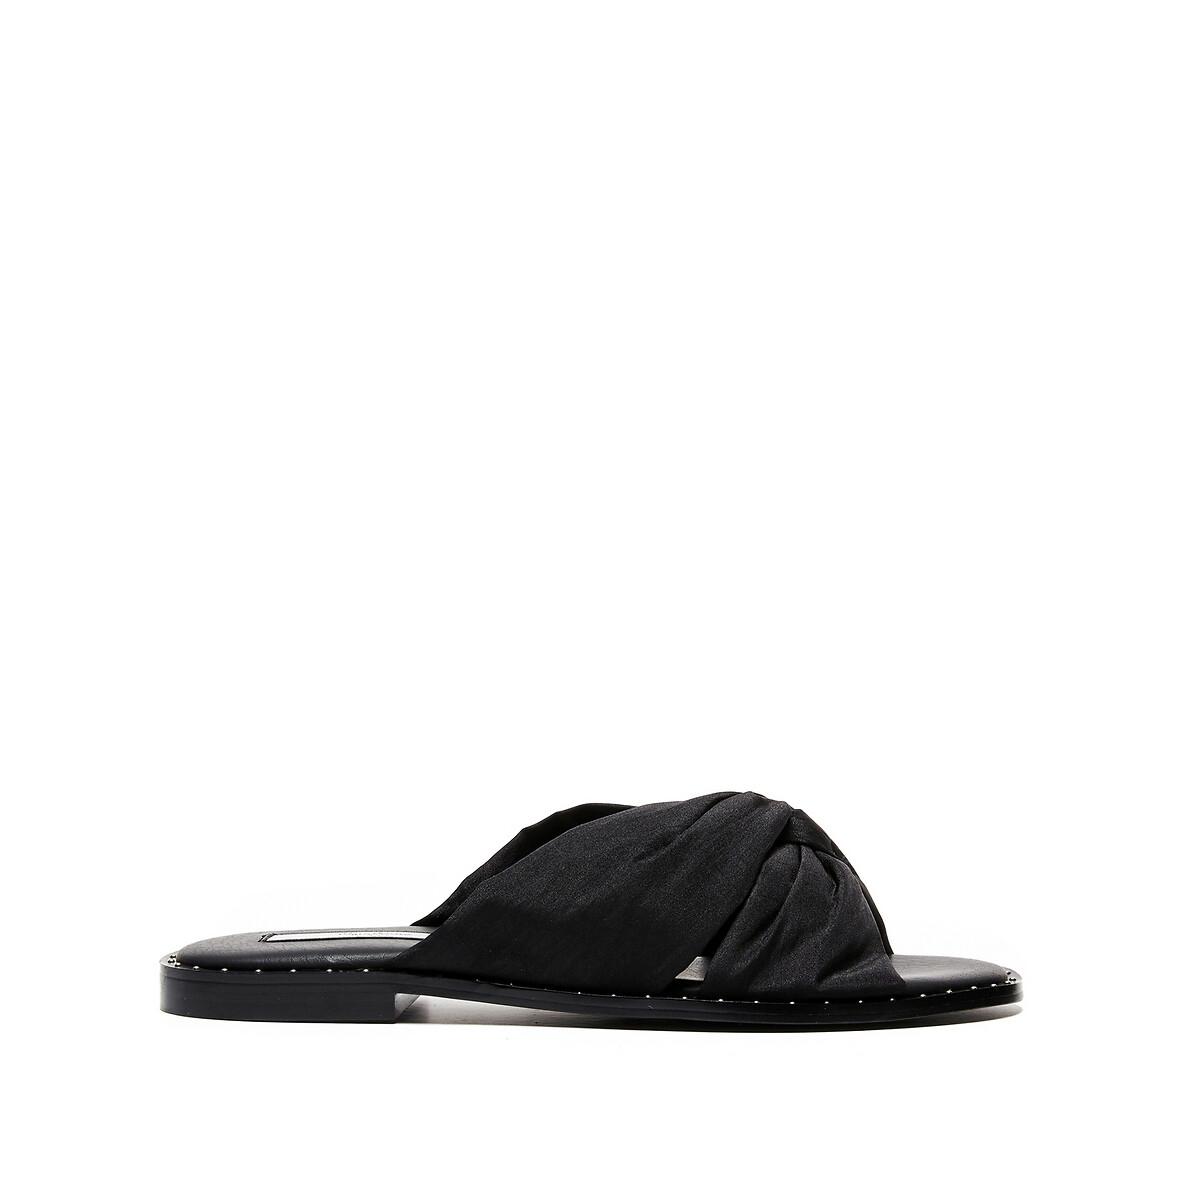 Туфли LaRedoute Без задника Hayes Naked 38 черный туфли без задника boite